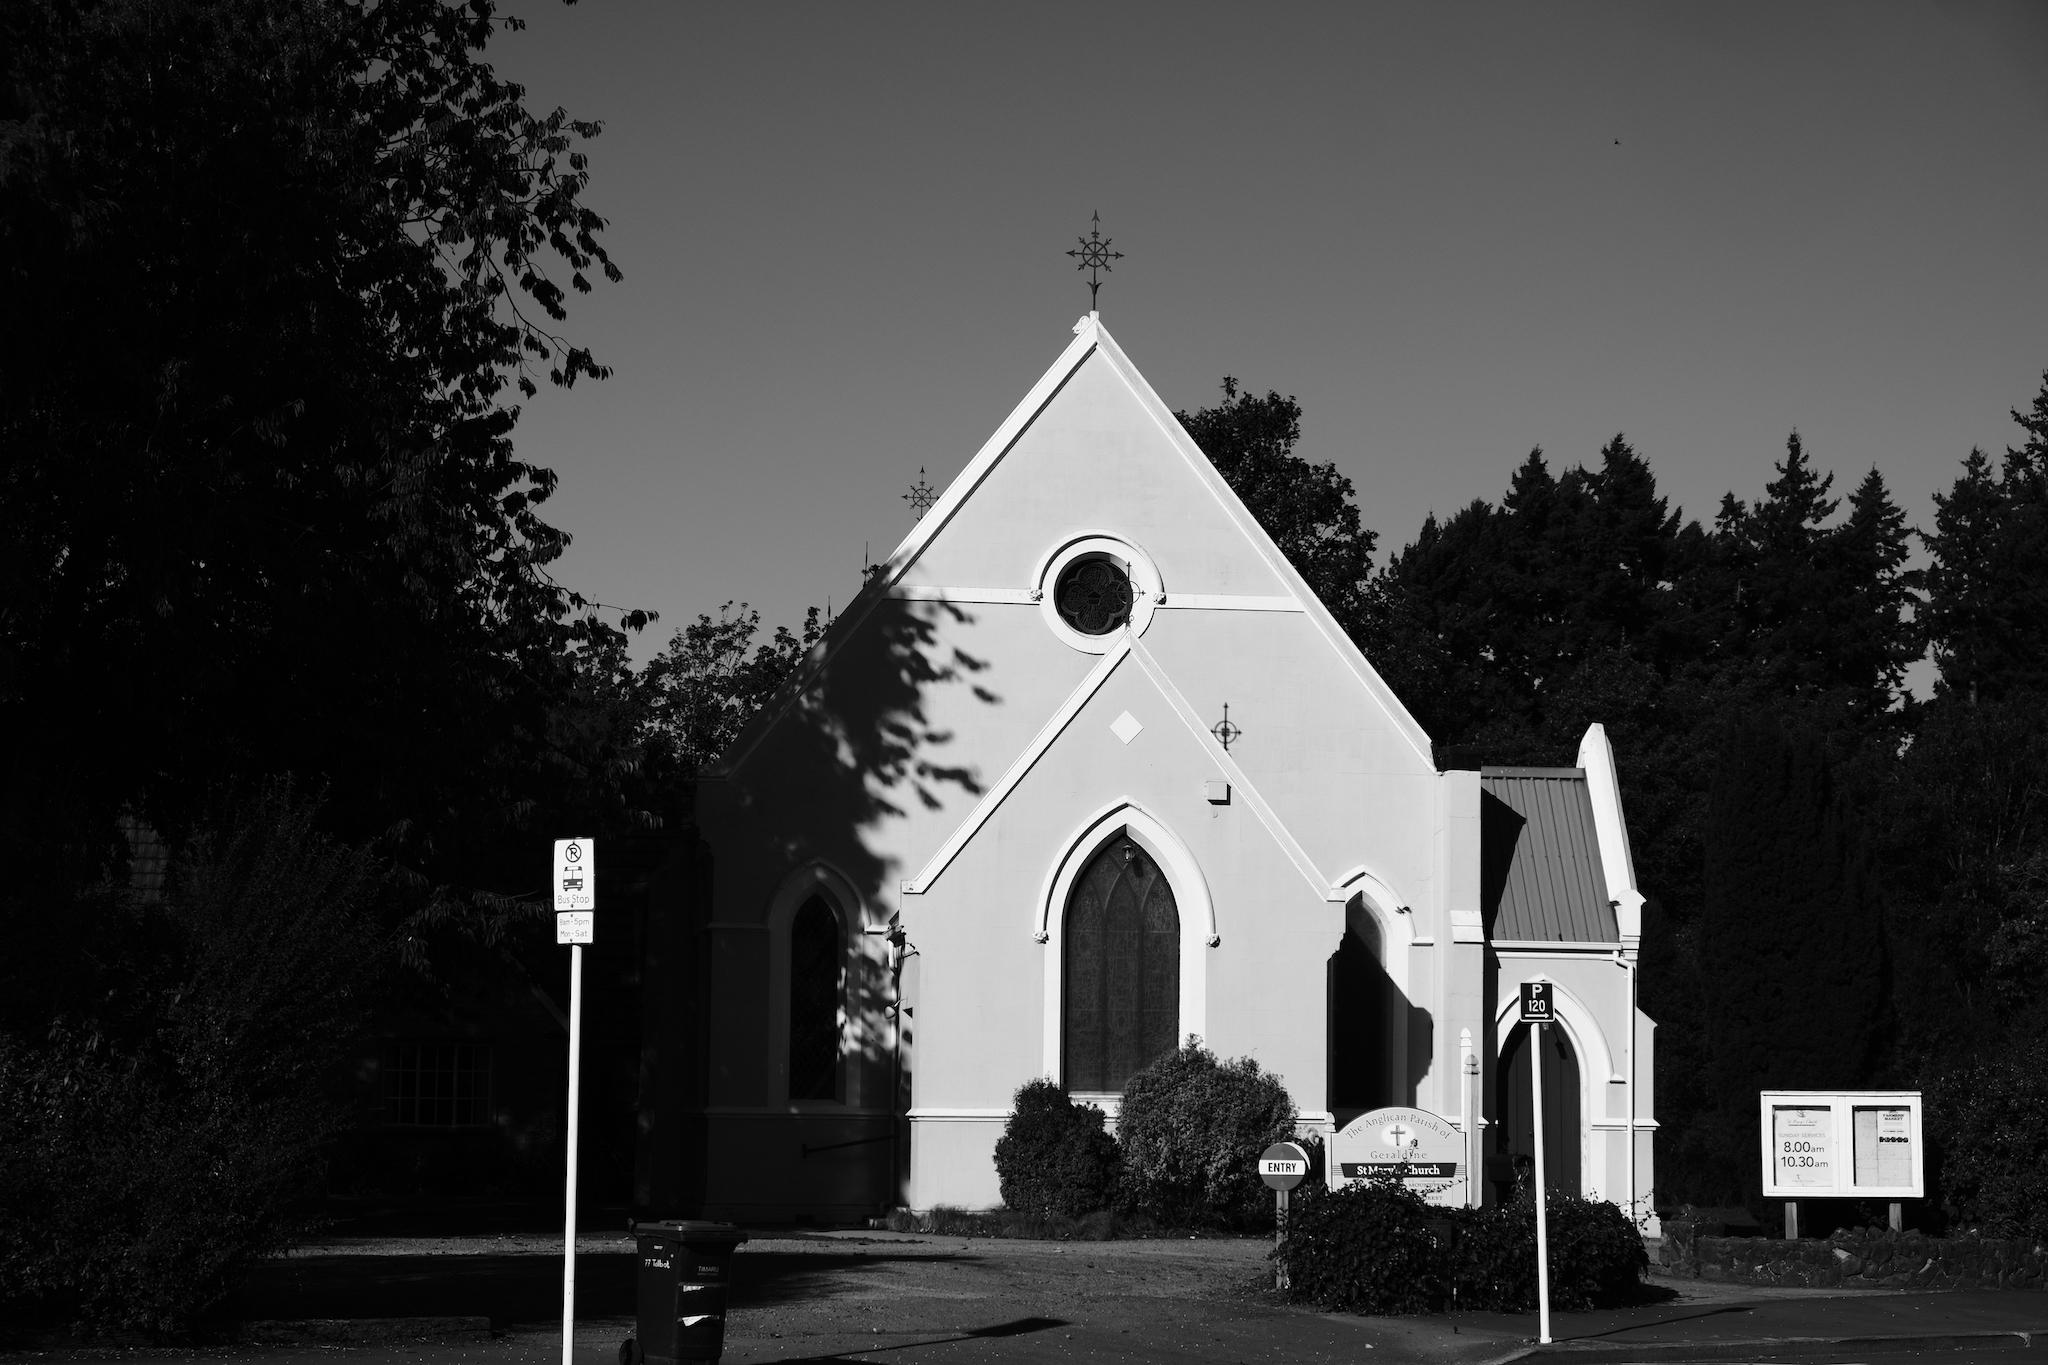 St Mary's, Geraldine